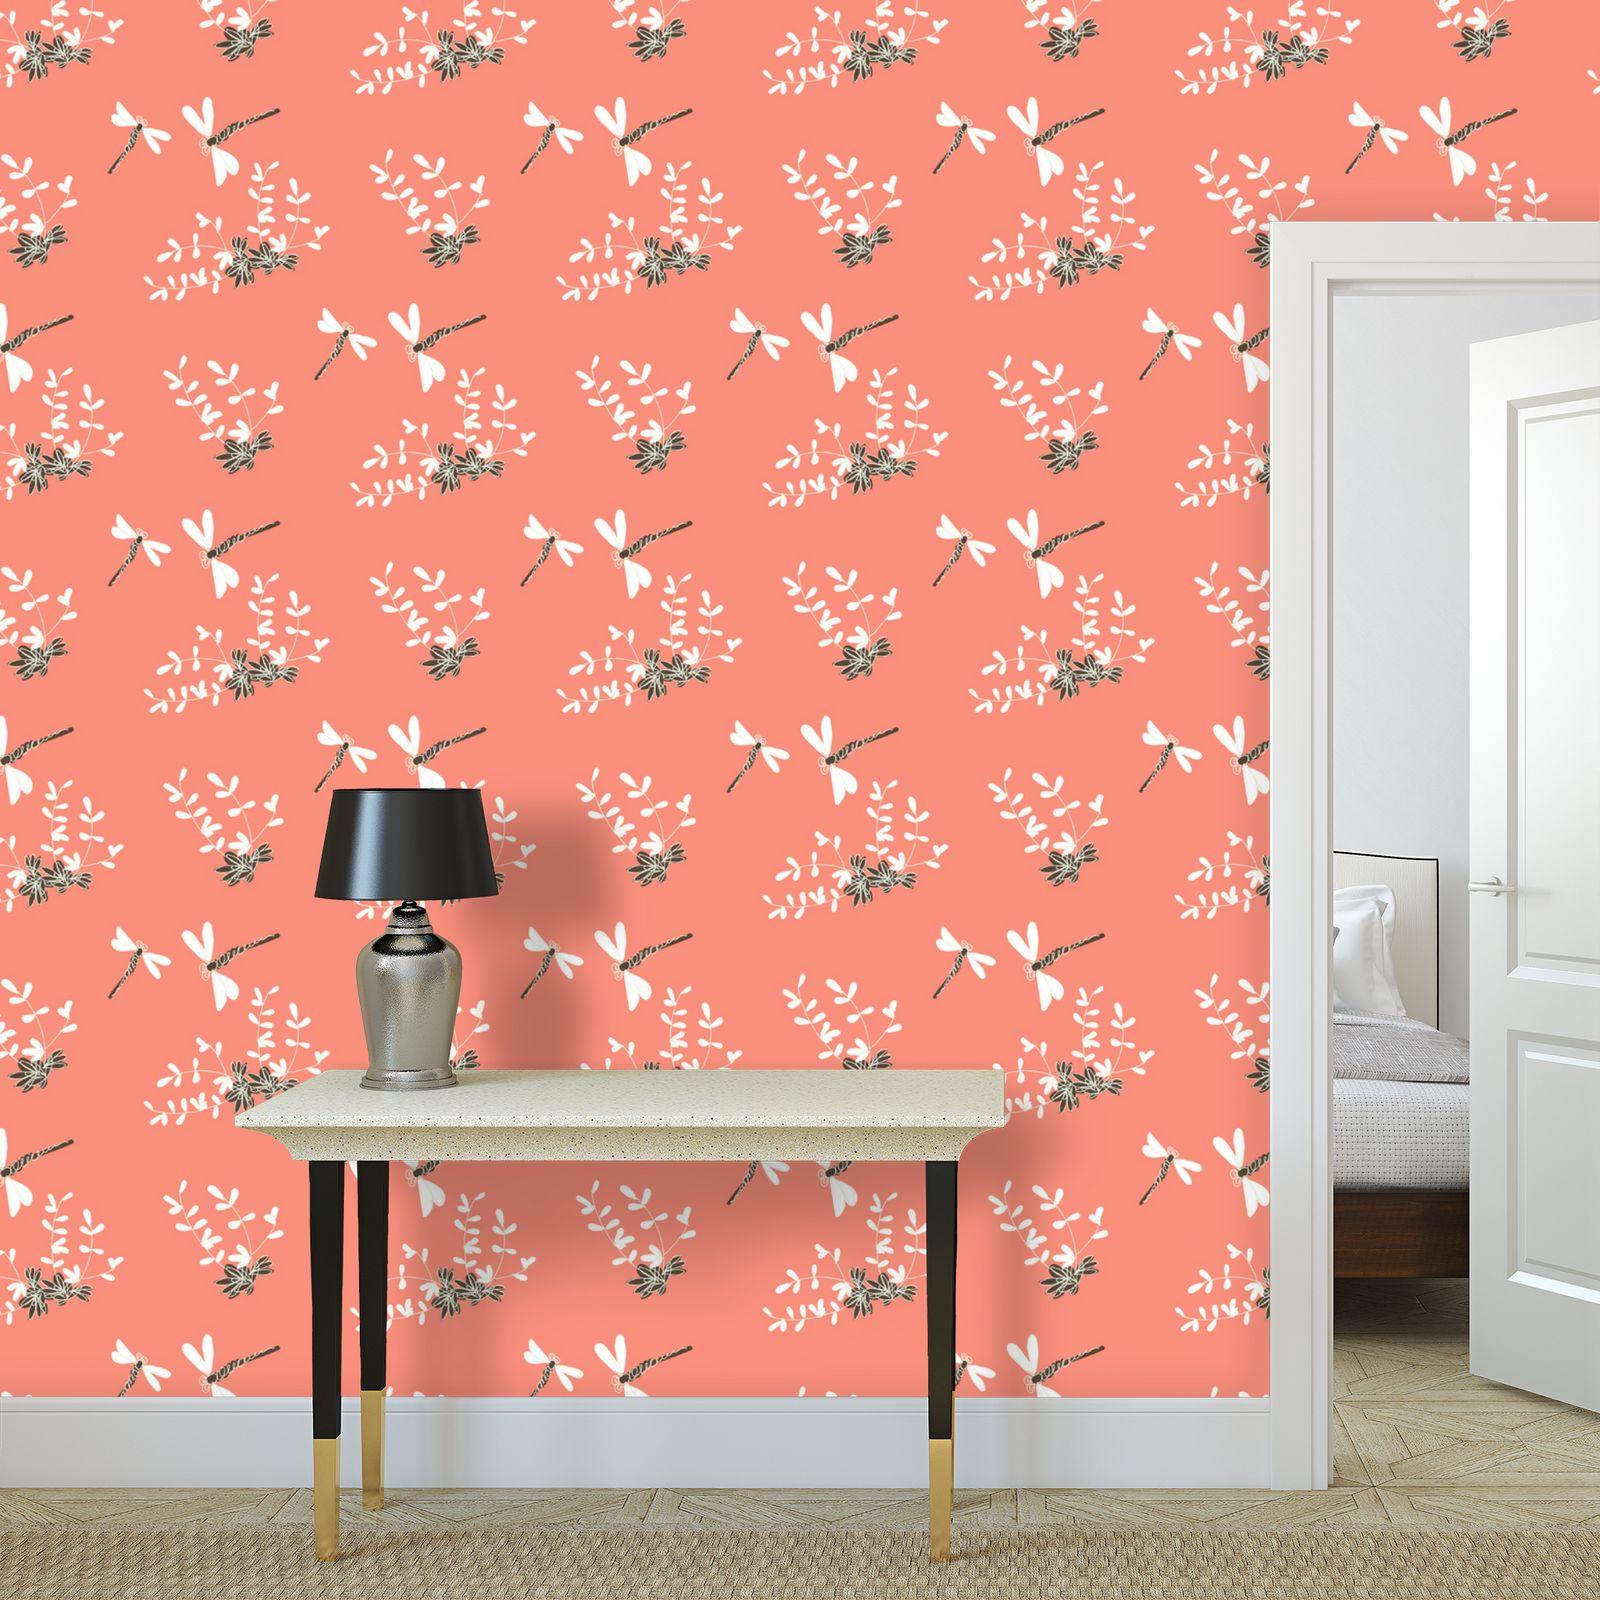 Hot day - Wallpaper Rolls - summer dragonflies, coral pink, natural gift